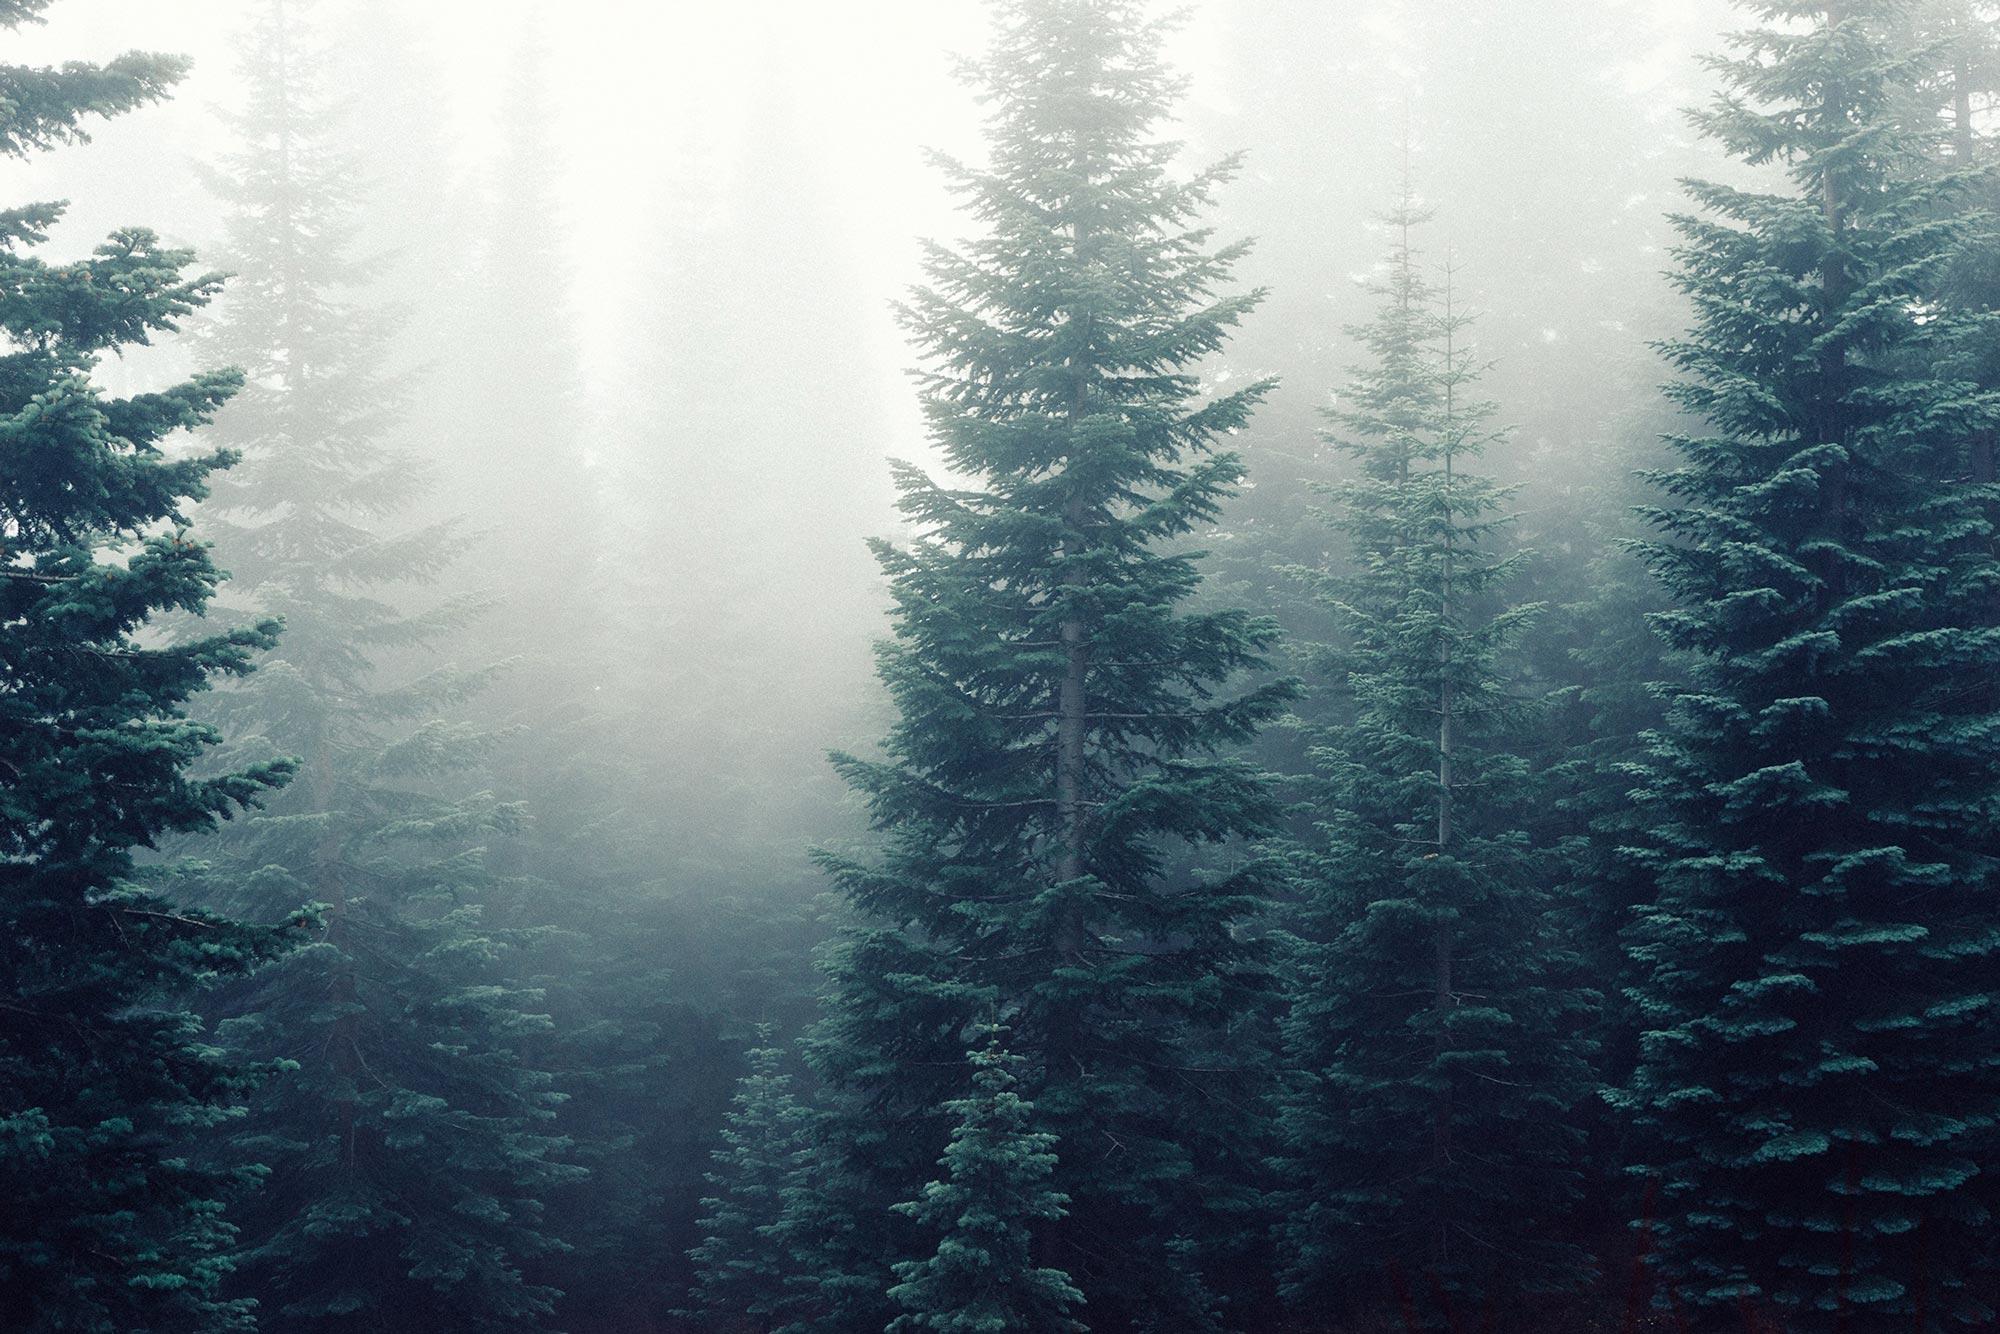 Pines?